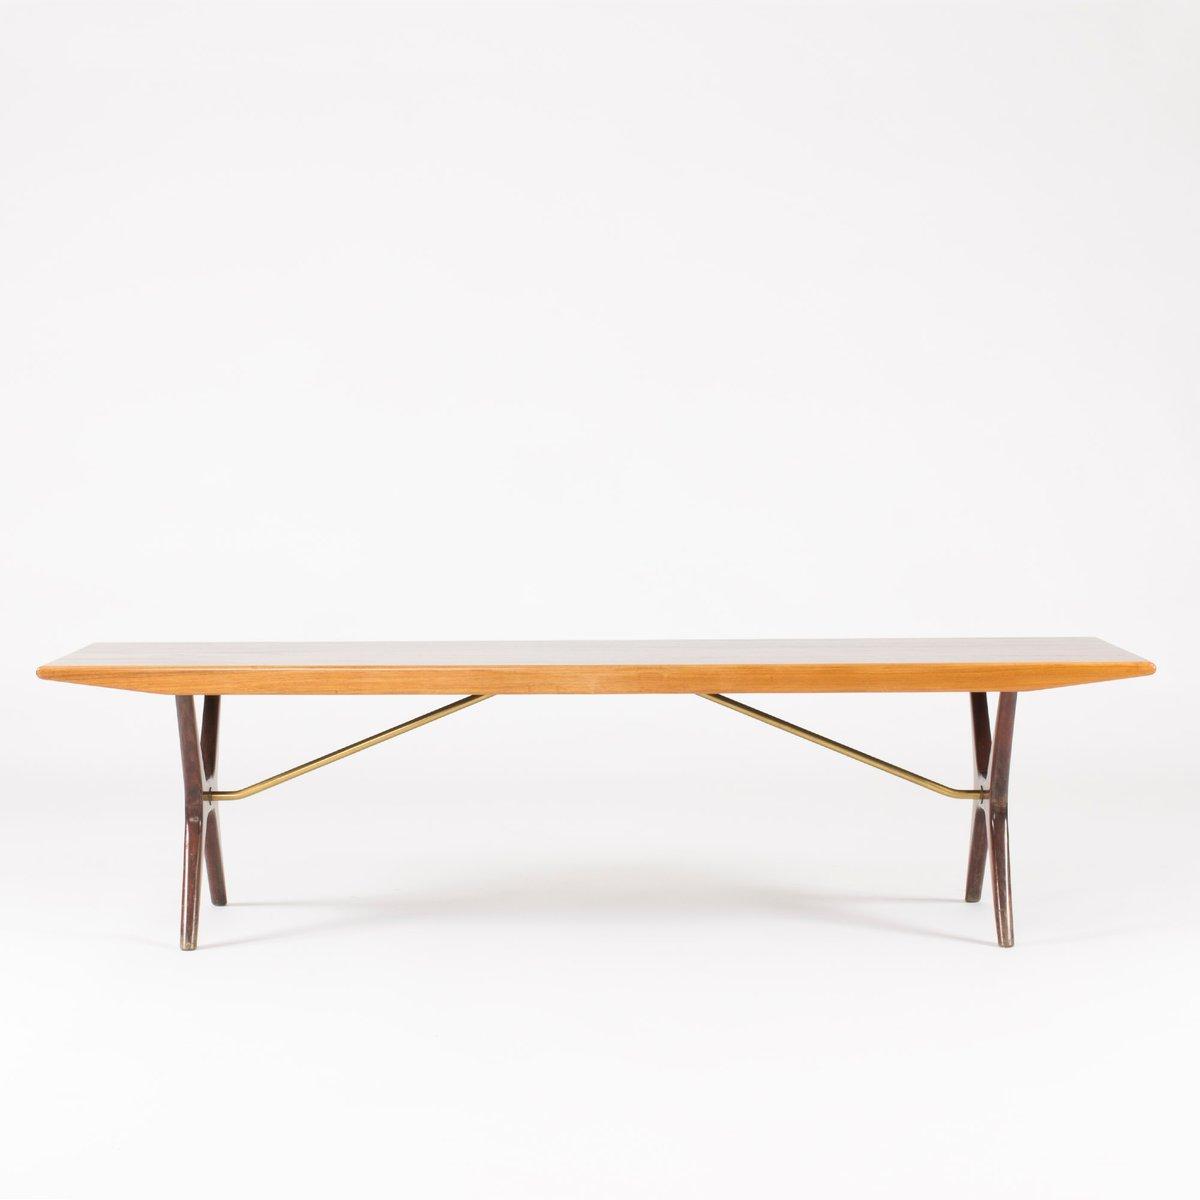 Swedish Rosewood Birch Coffee Table By Karl Erik Ekselius For Joc Vetlanda 1950s For Sale At